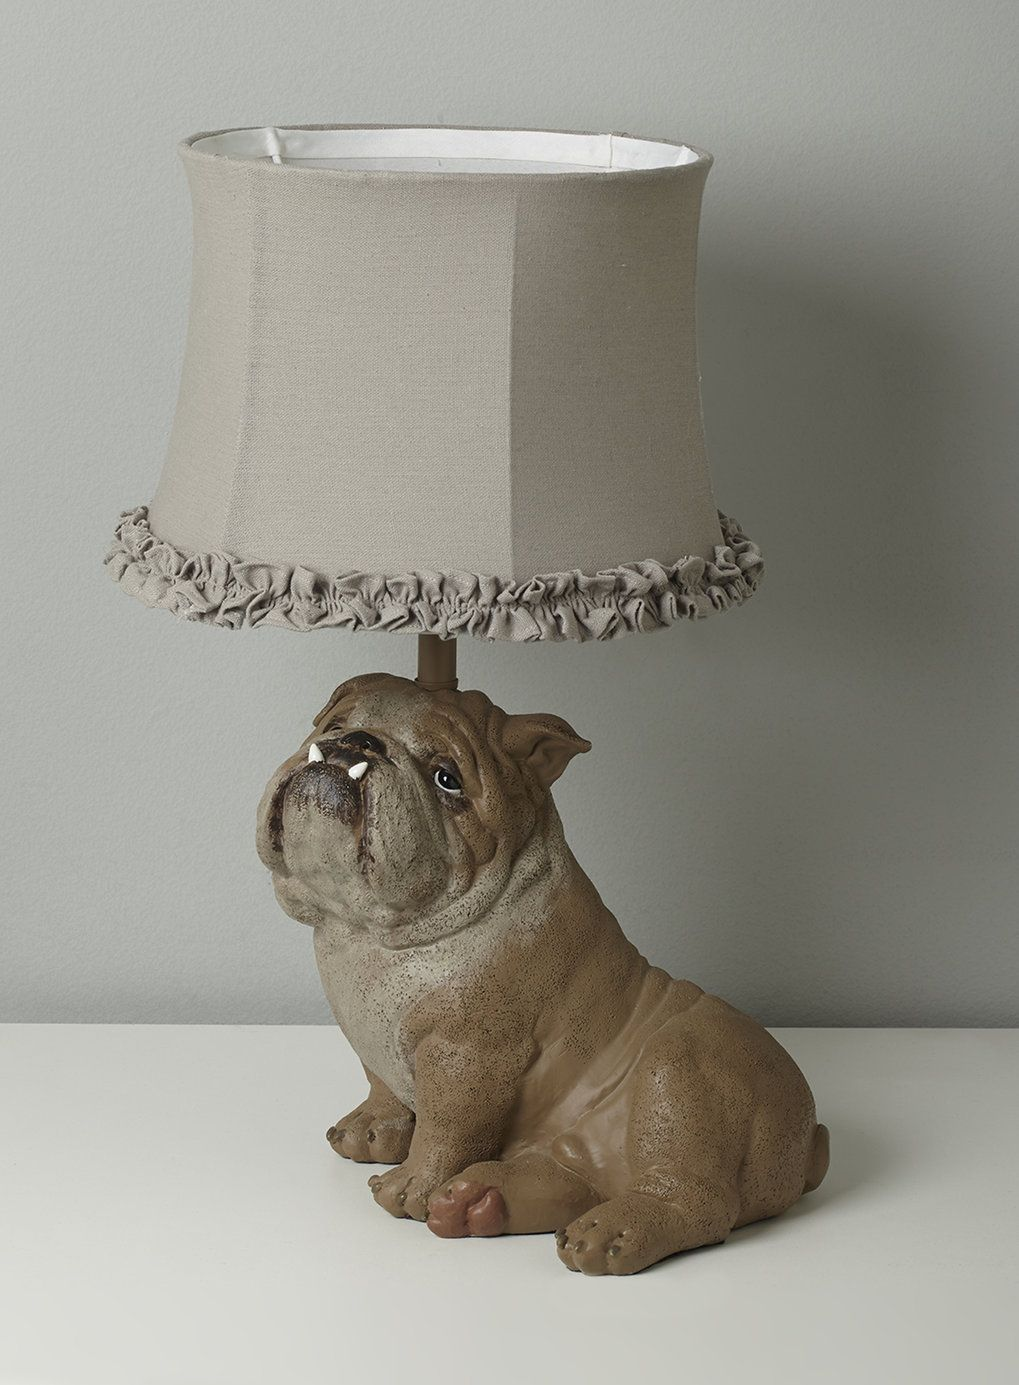 #Bulldog Table Lamp   #Home #Decor